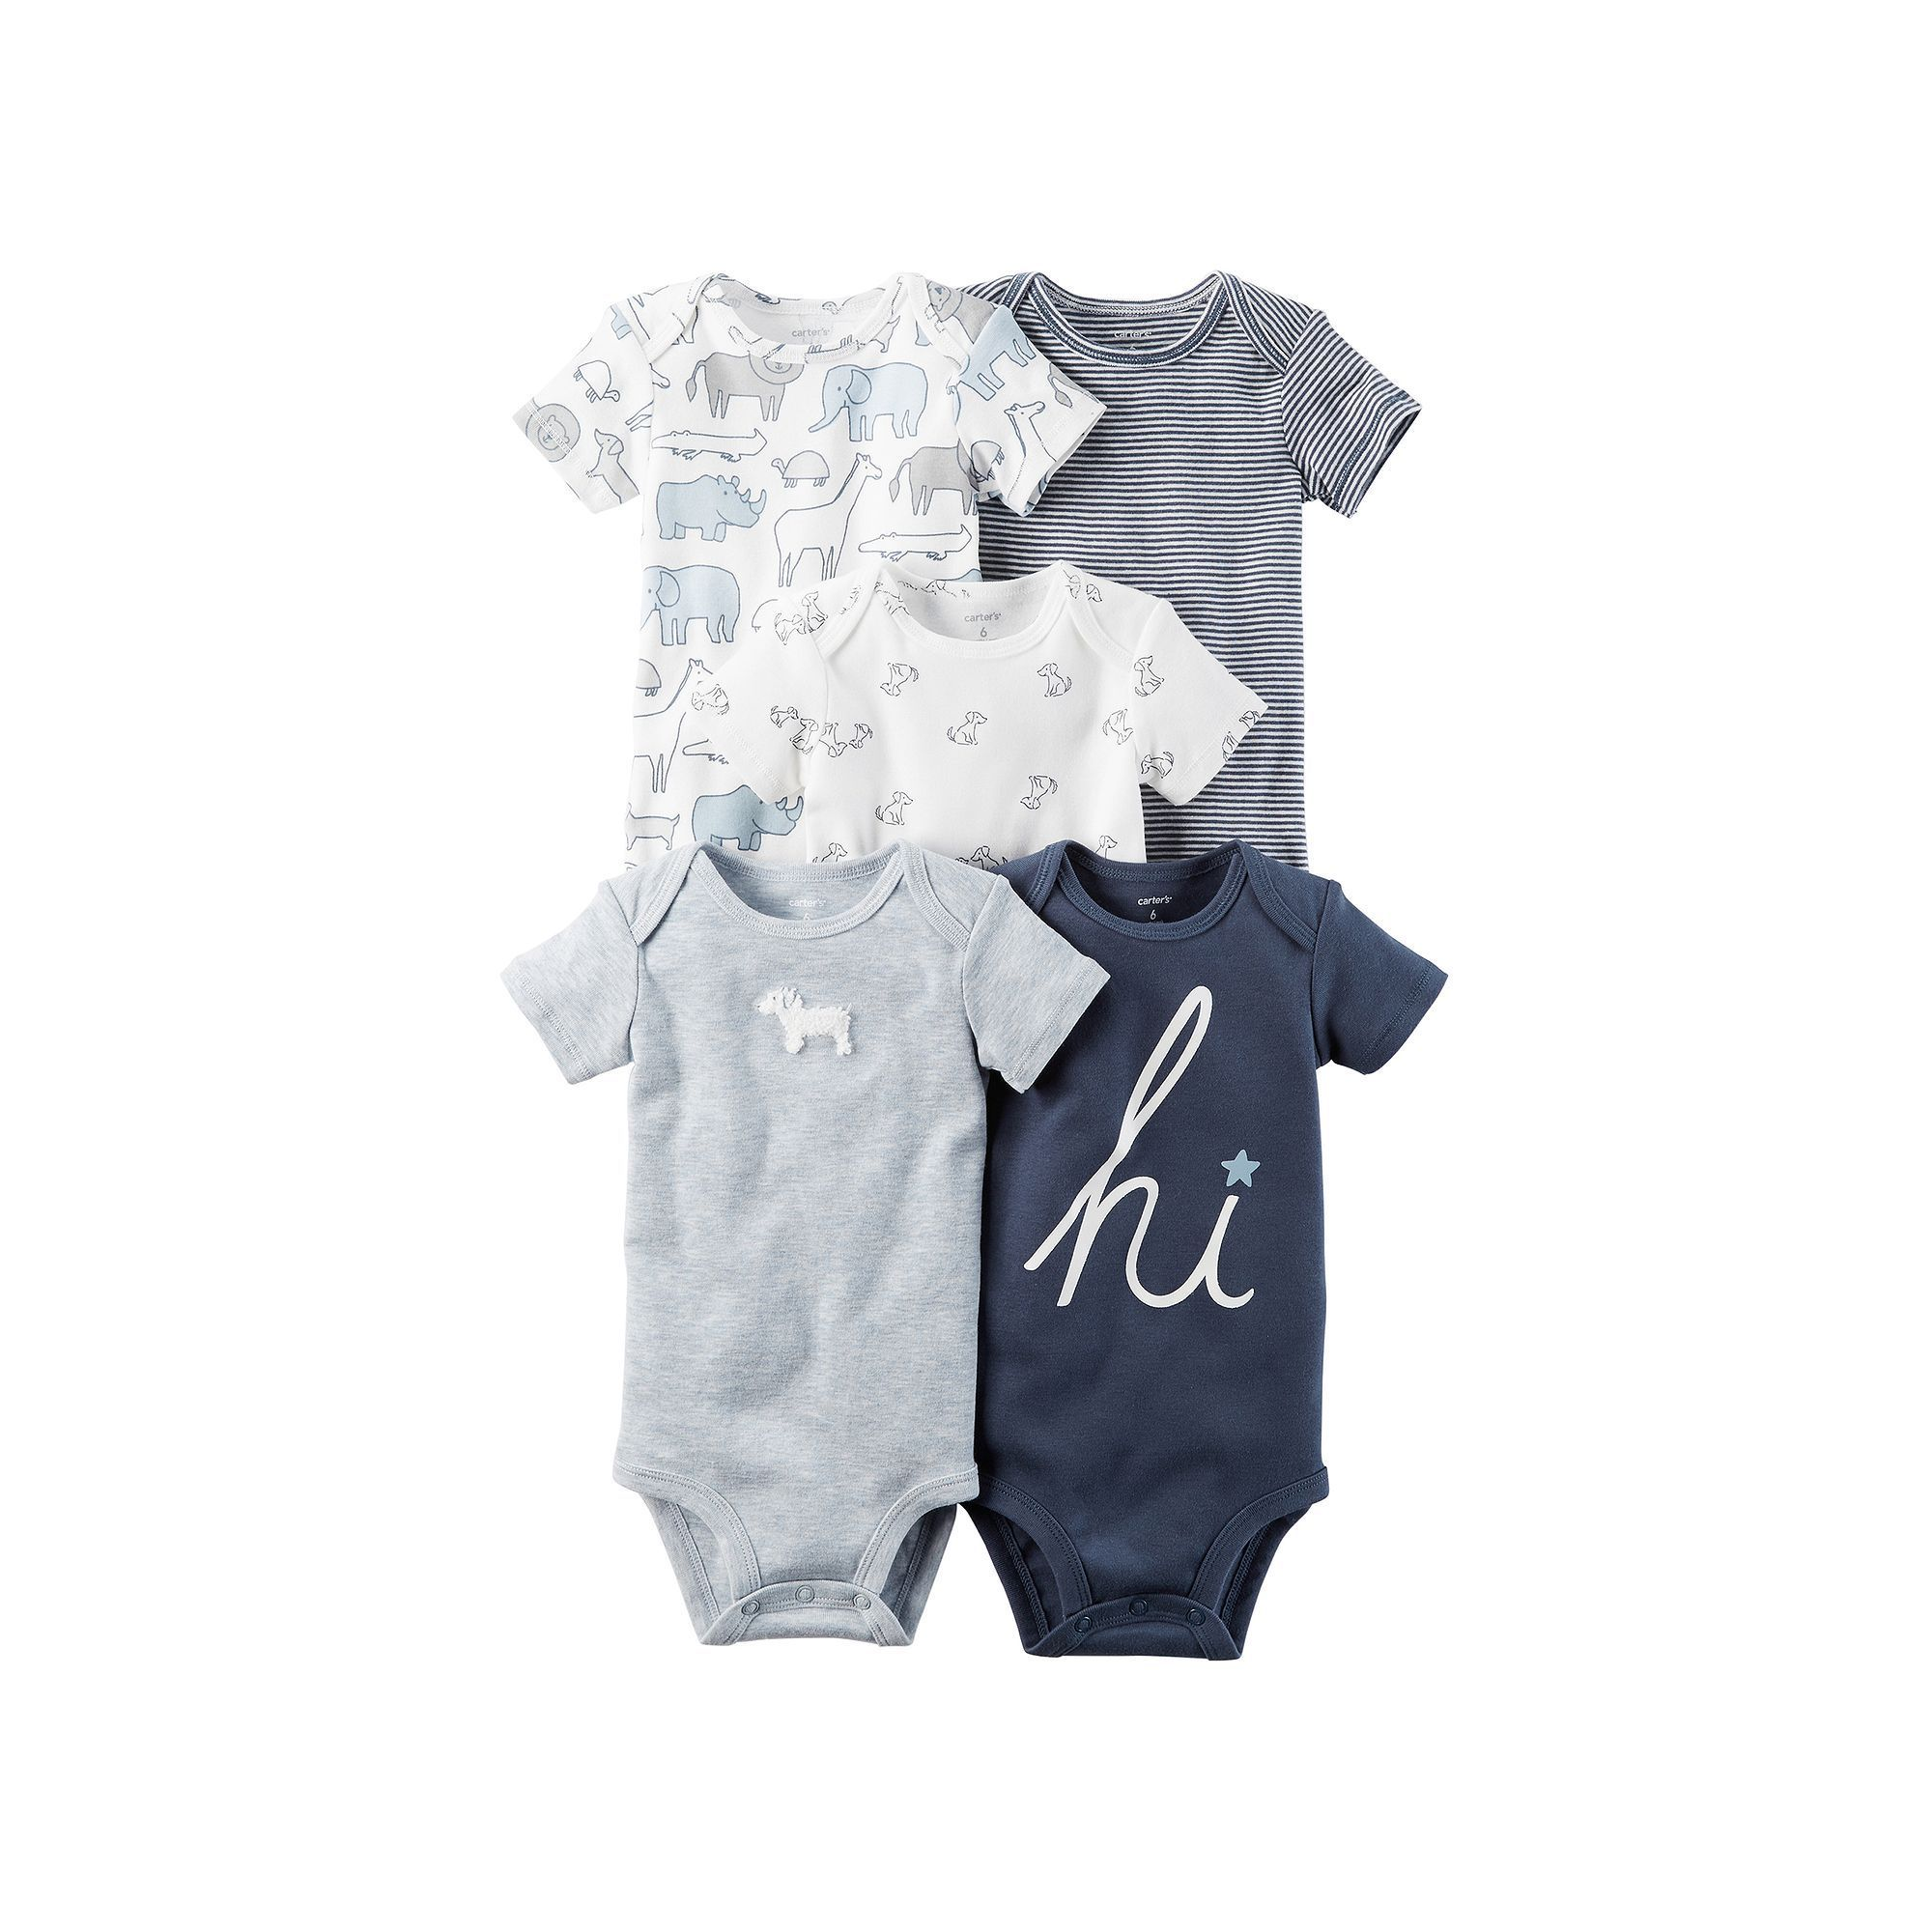 Carter s Baby Boy 5 pk Short Sleeve Bodysuits